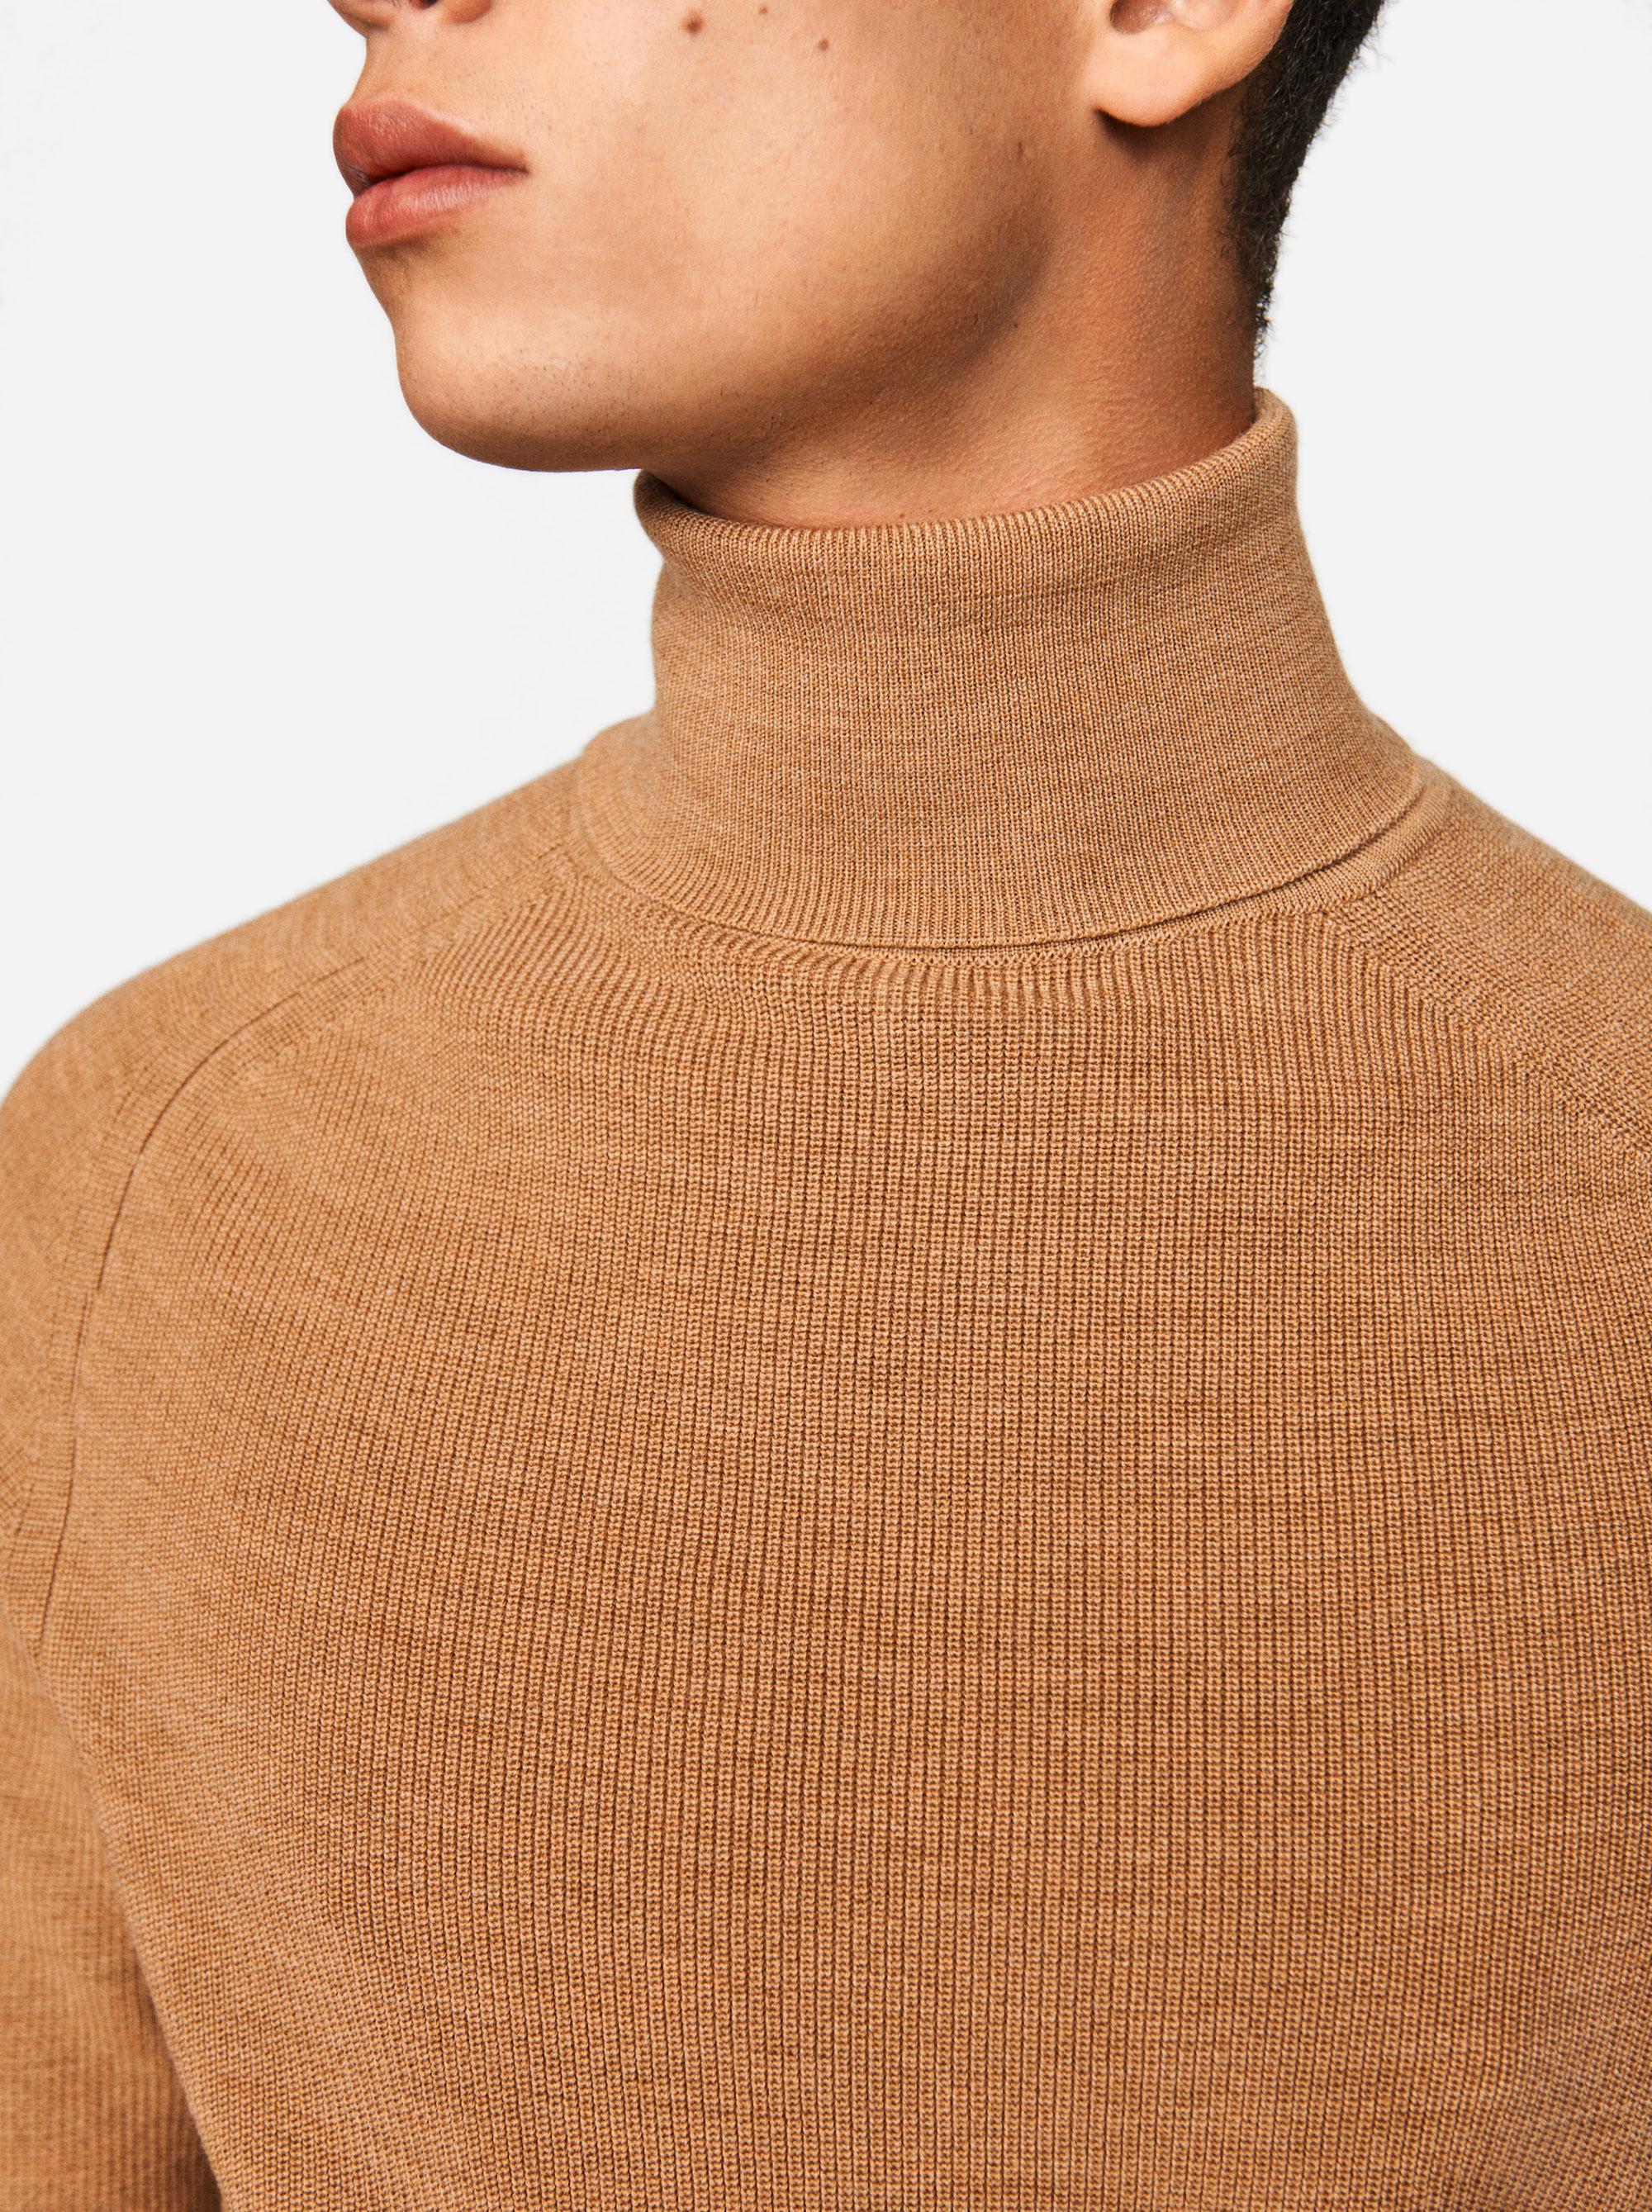 Teym - Turtleneck - The Merino Sweater - Men - Camel - 3